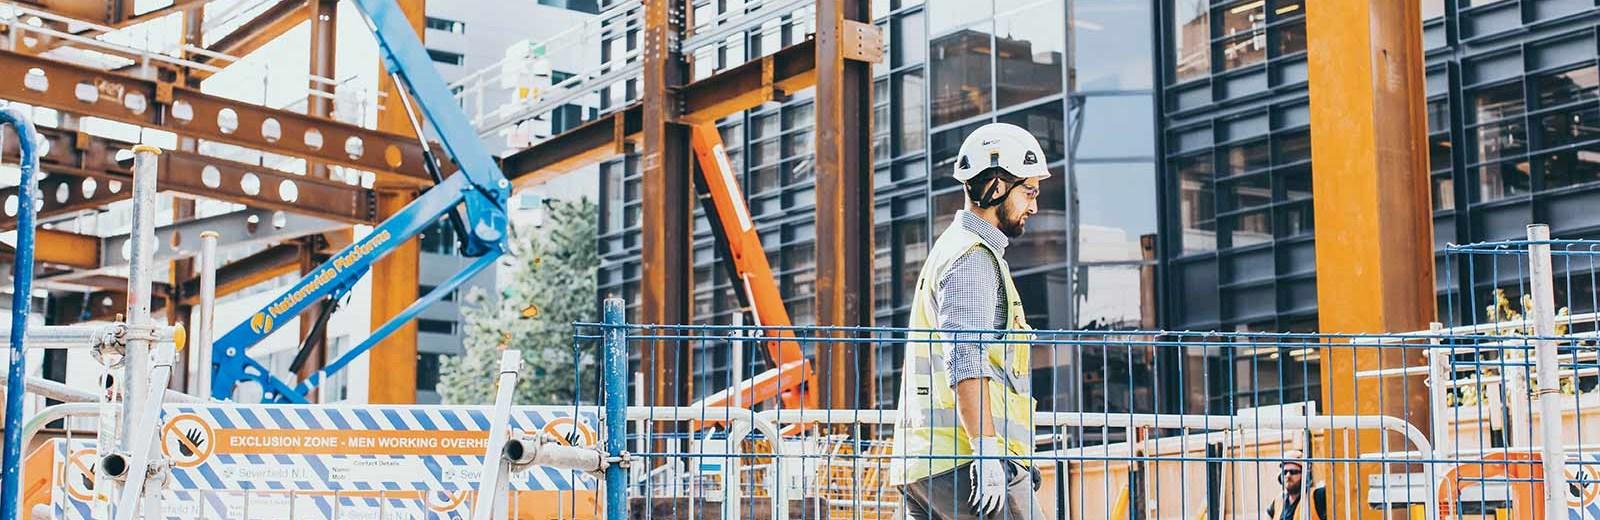 A man on a construction site